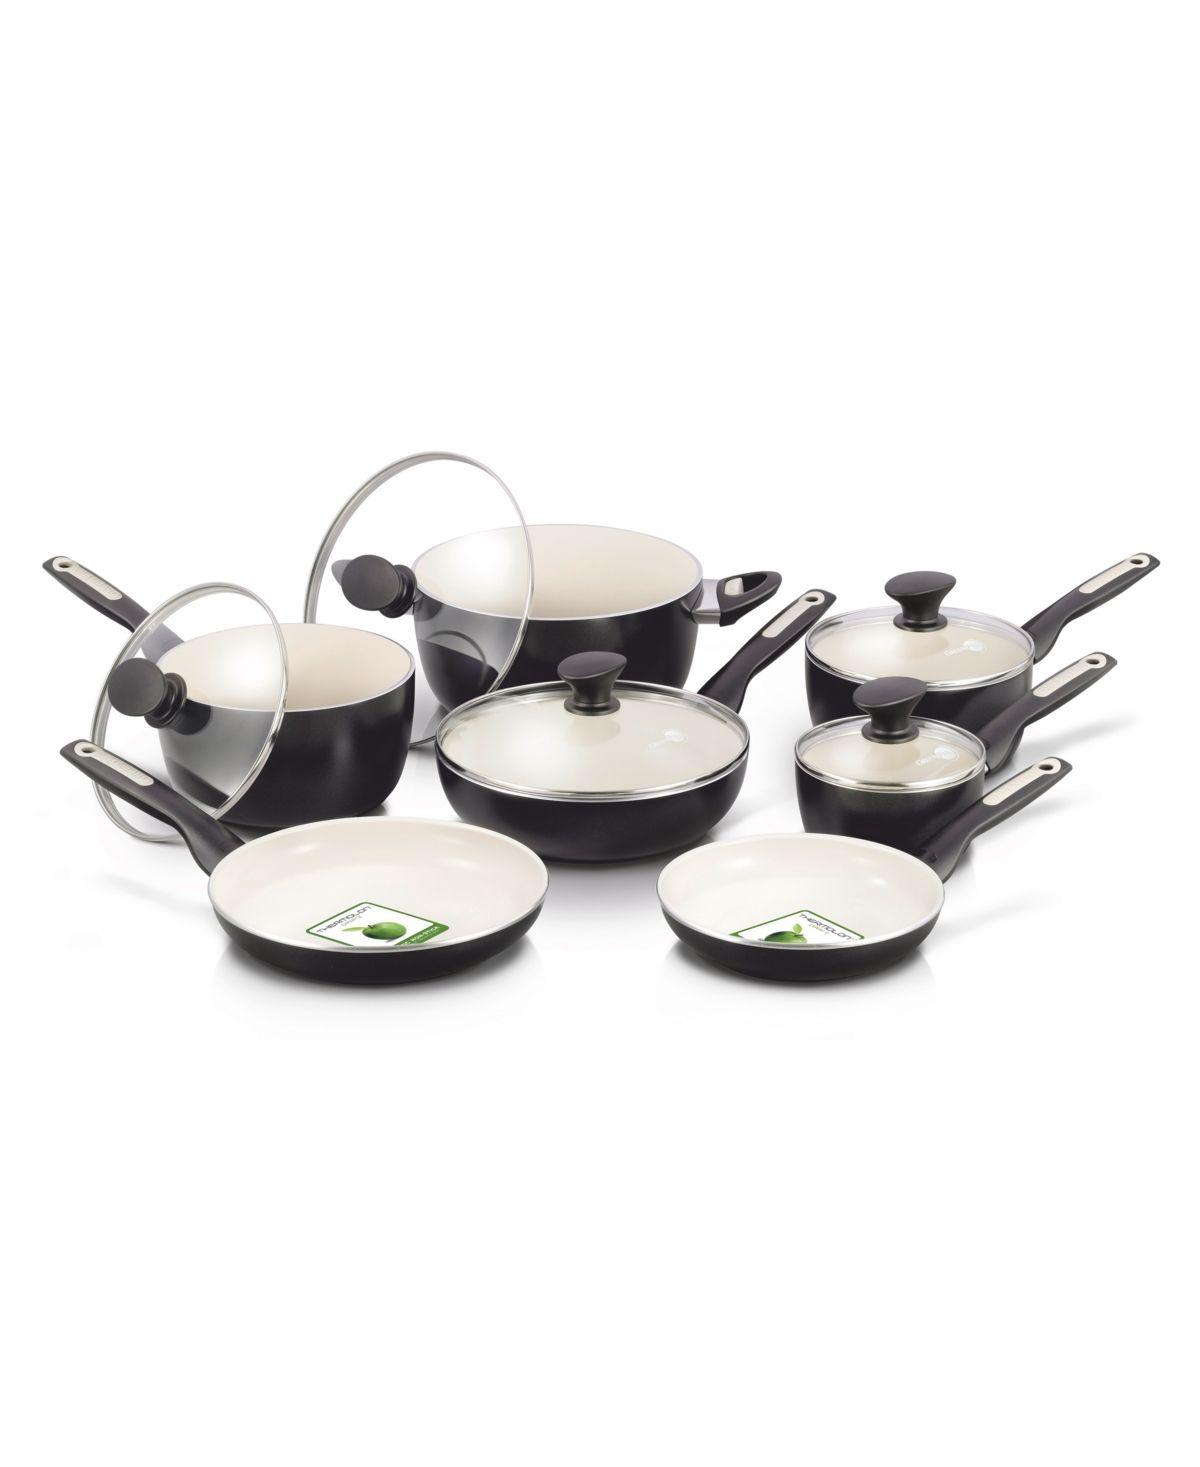 Greenpan Rio 12 Pc Ceramic Non Stick Cookware Set Reviews